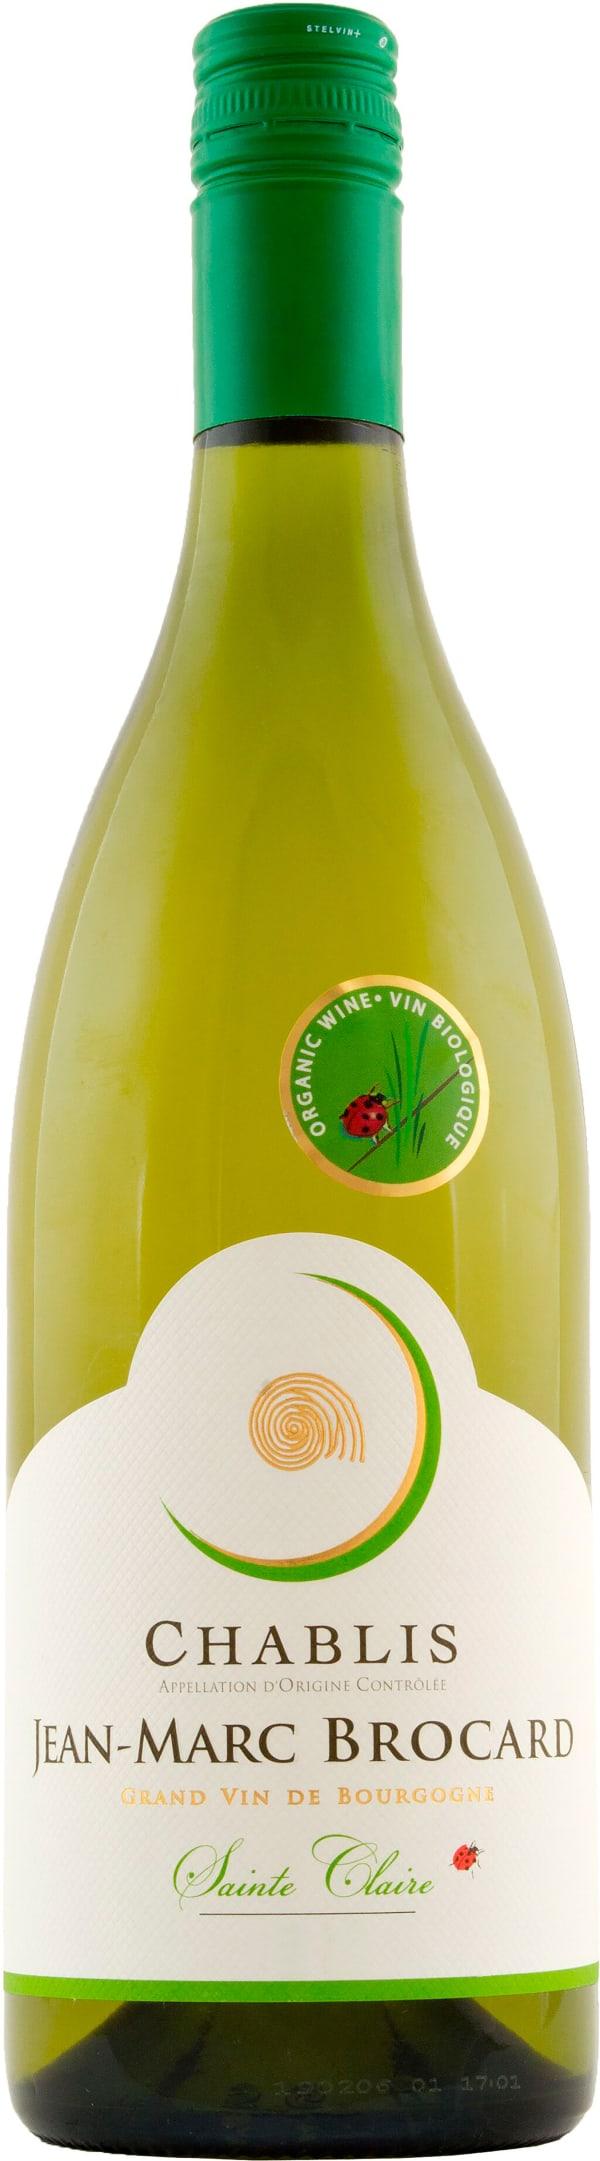 Brocard Chablis Sainte Claire Organic 2015